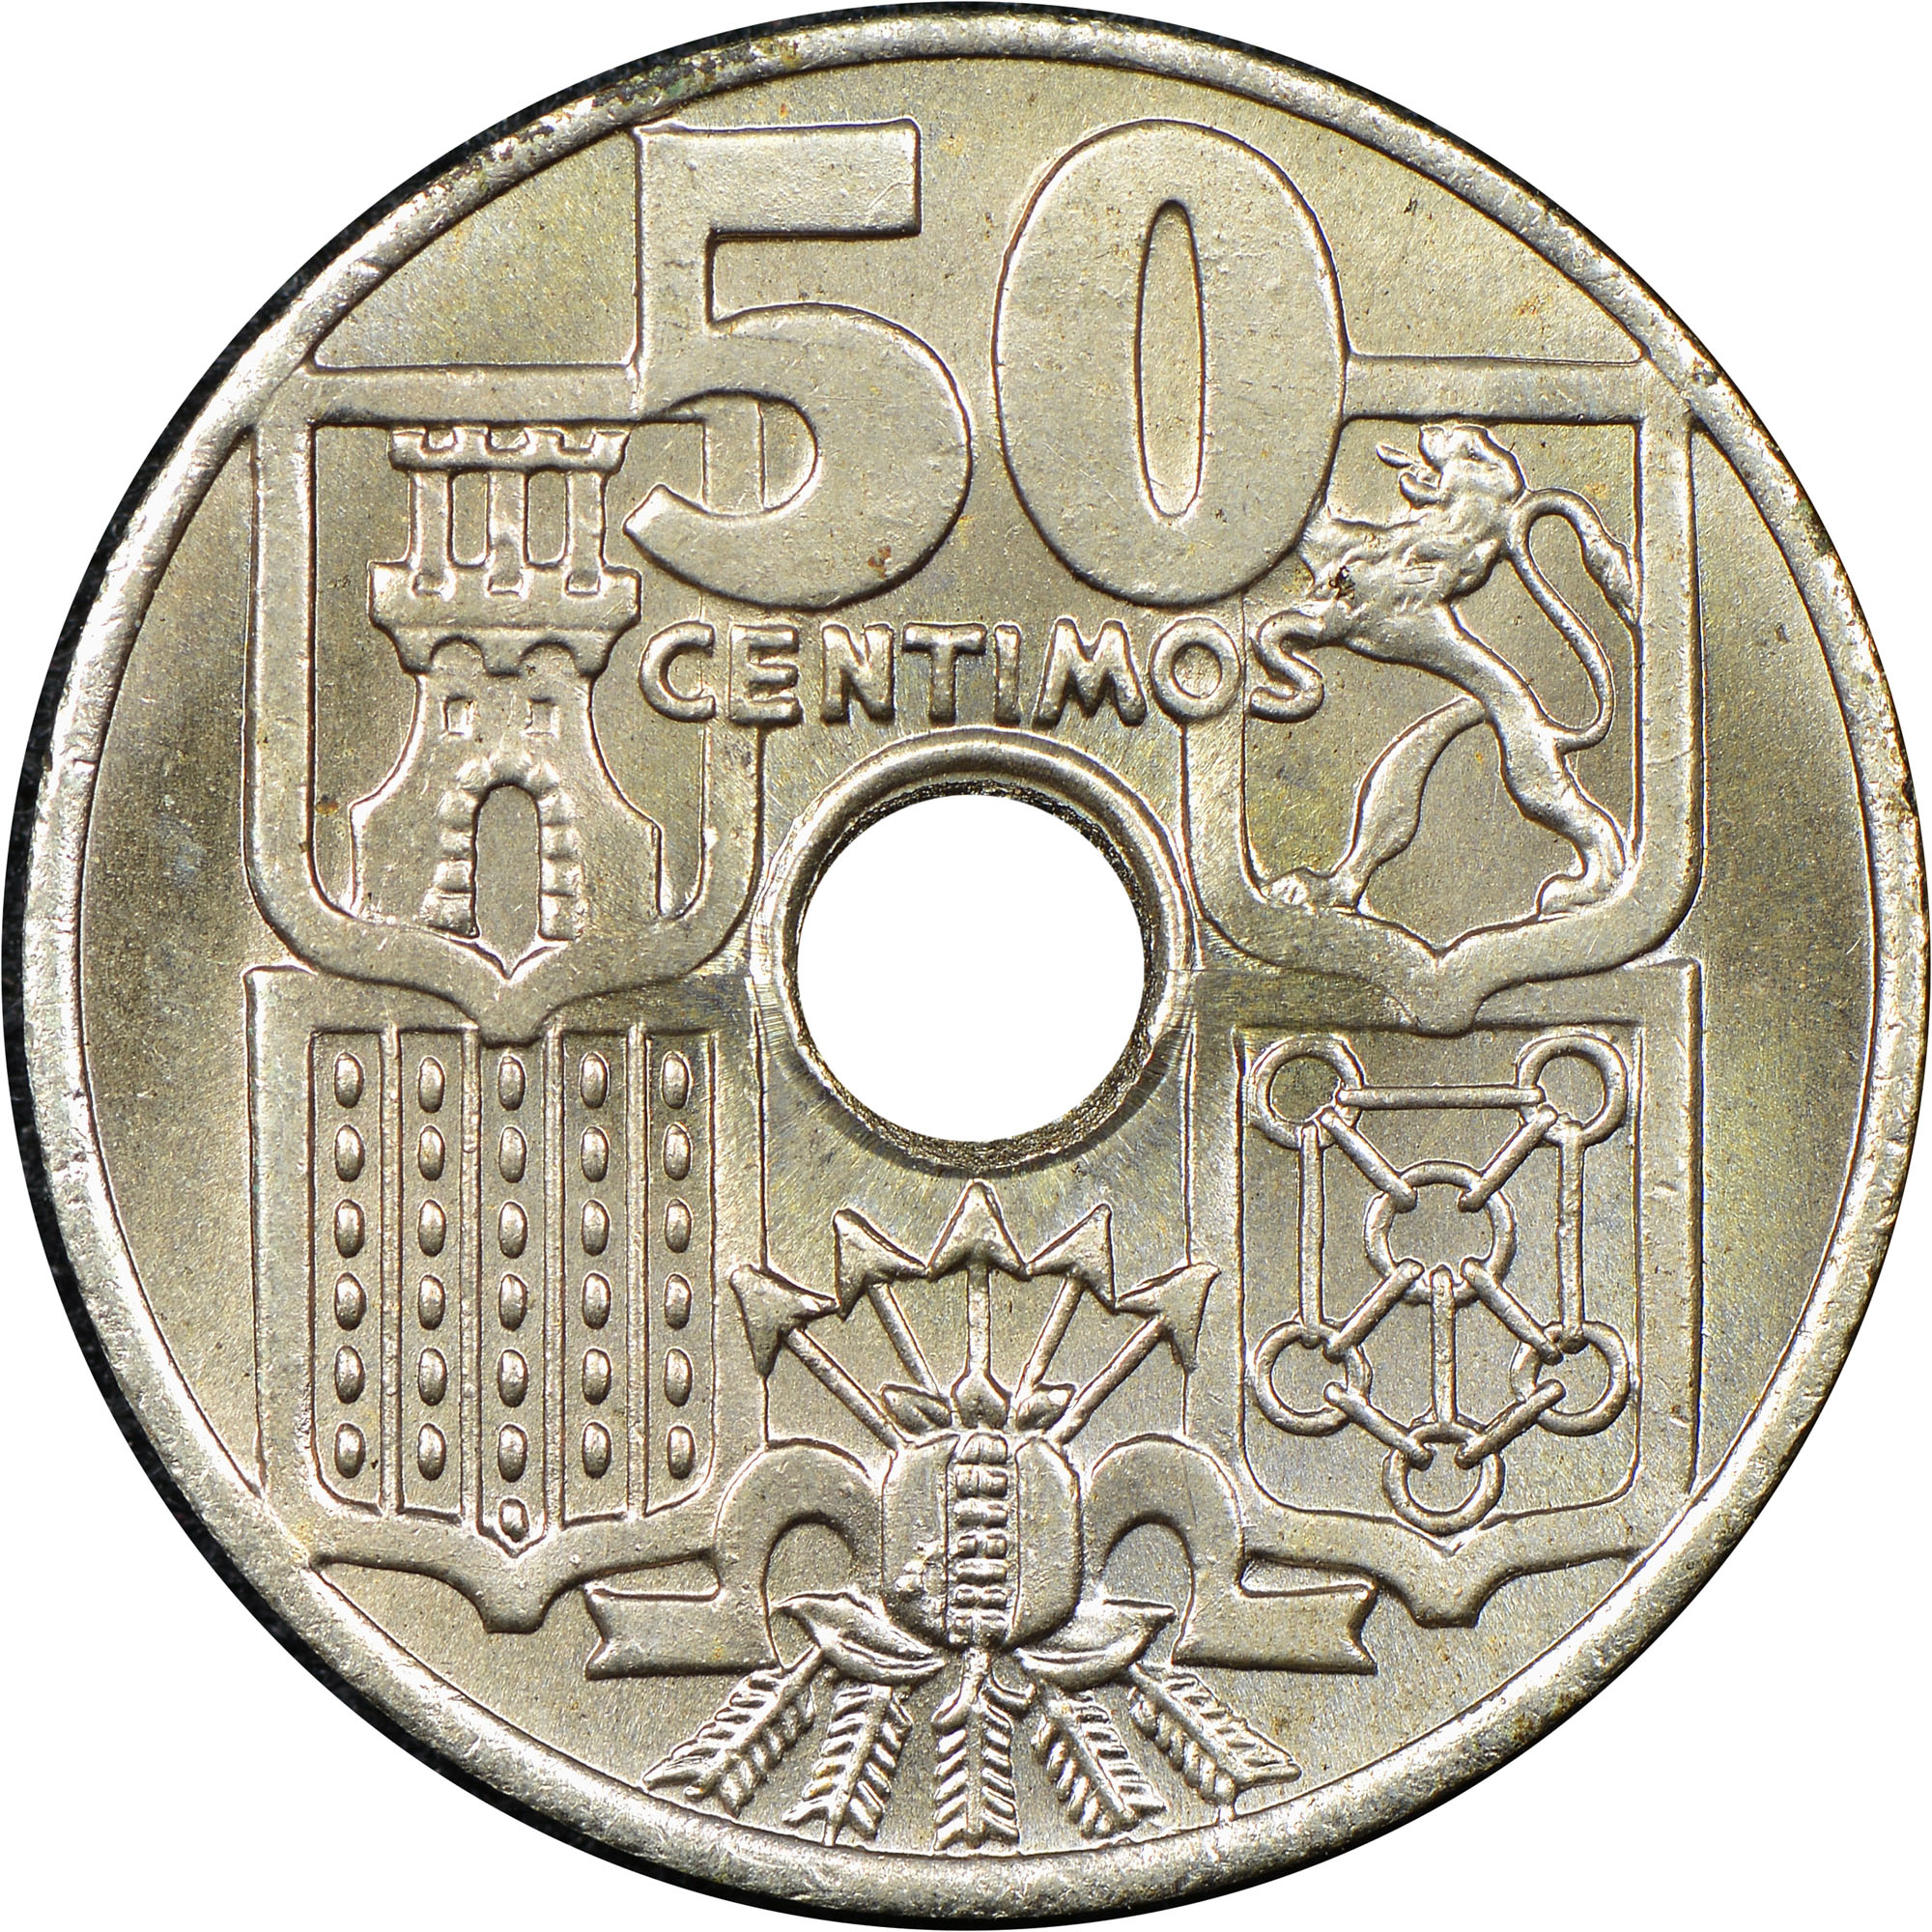 - 50 Centimos Copper-Nickel Coin hole in center Spain 1949 Anchor 51